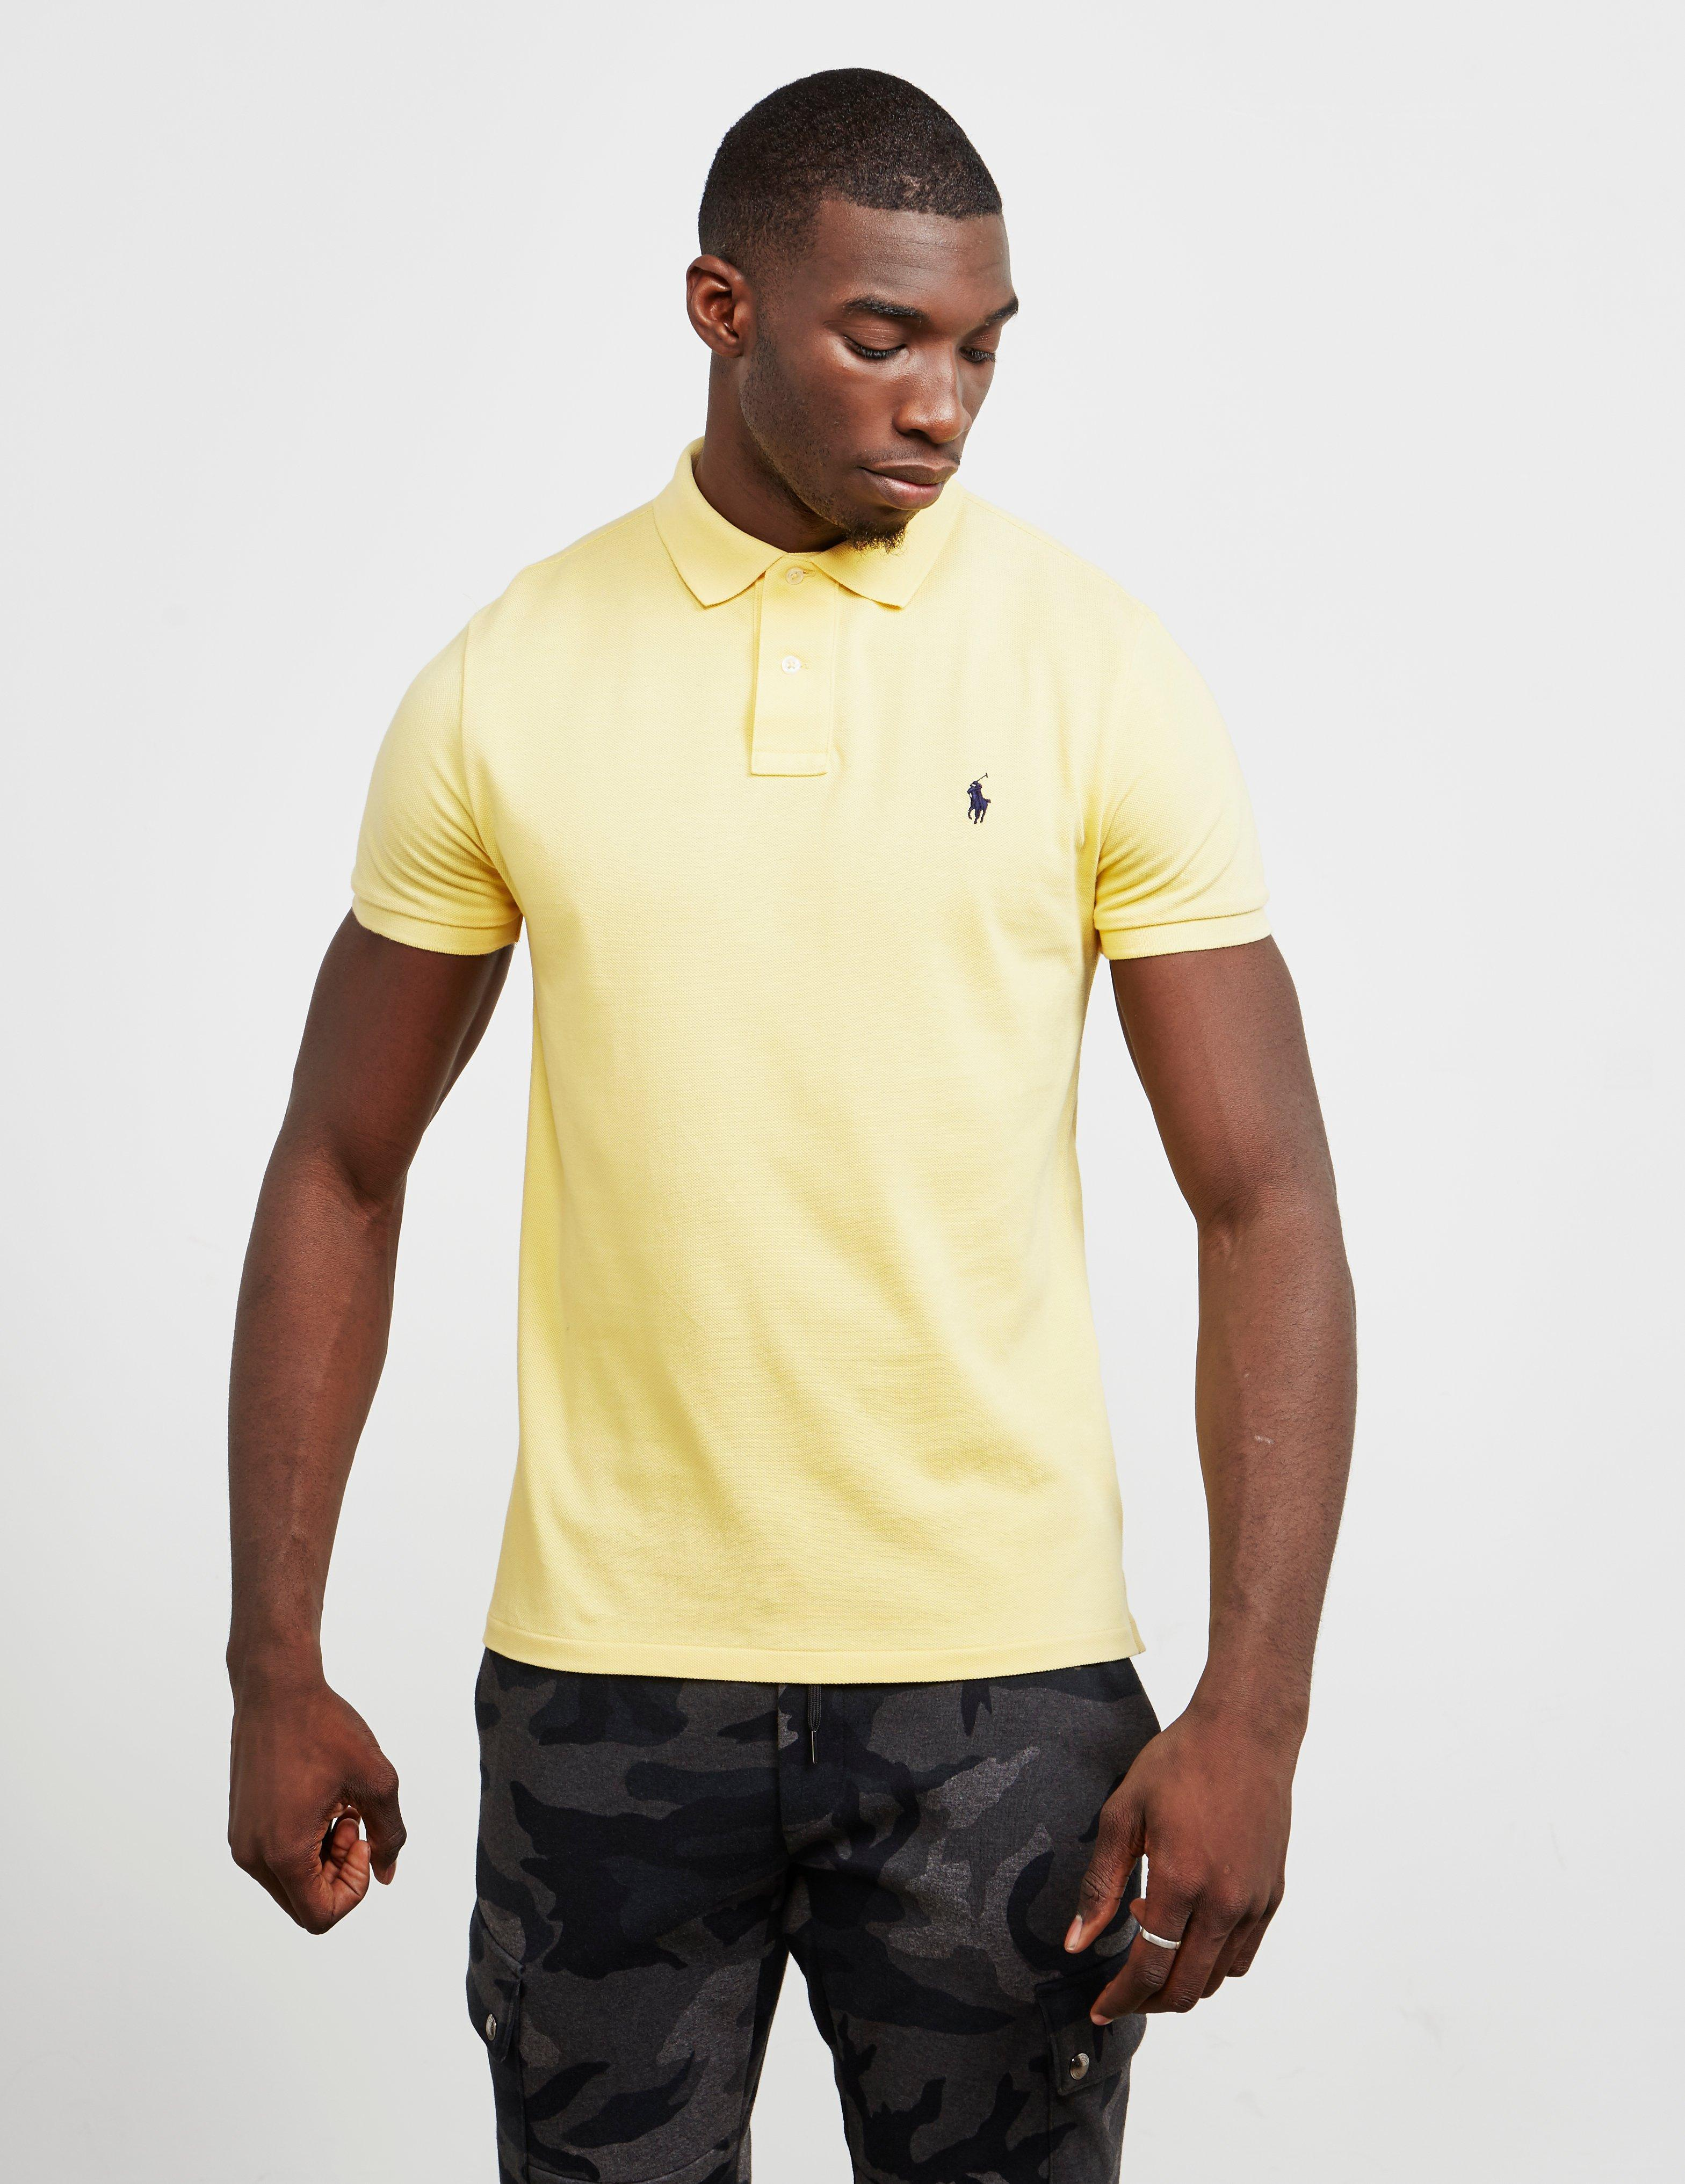 c6de4fcdddb36 Lyst - Polo Ralph Lauren Mesh Short Sleeve Polo Shirt Yellow in ...